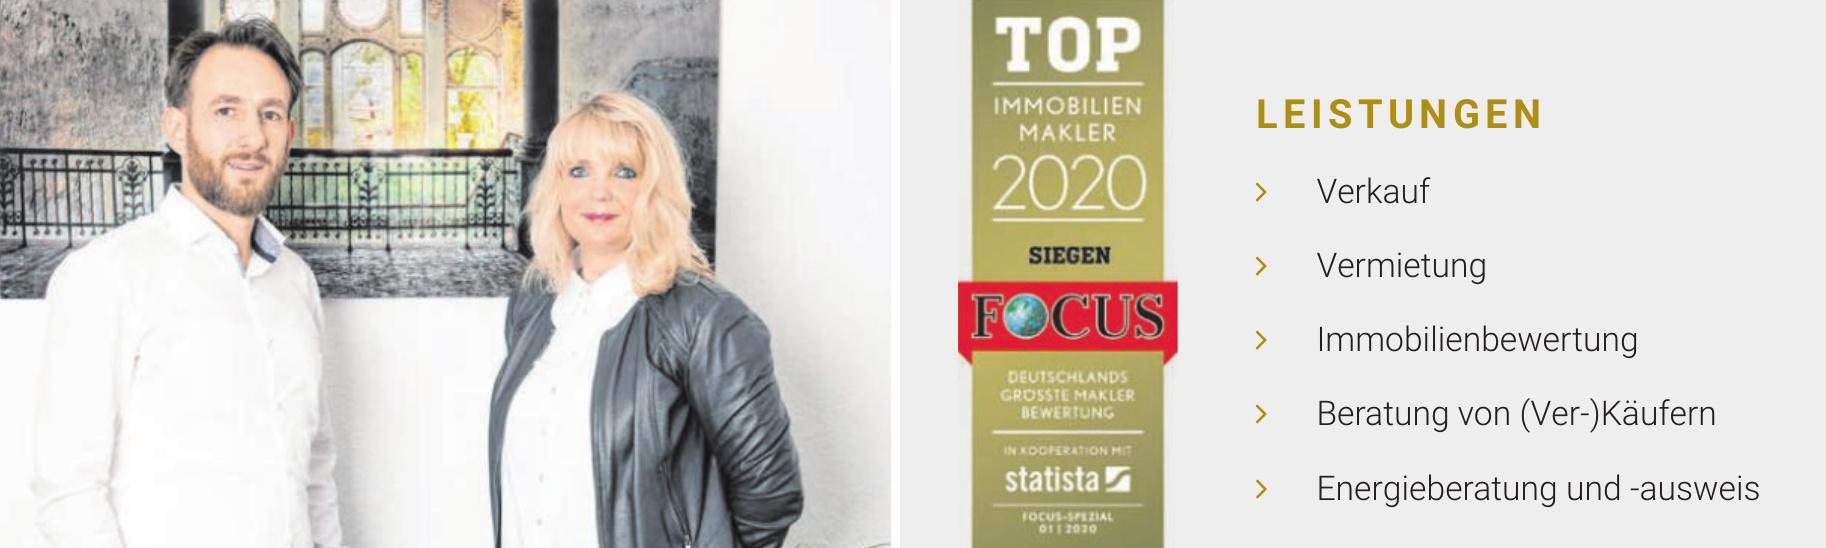 Immobilien-Beratung Friedrich GmbH